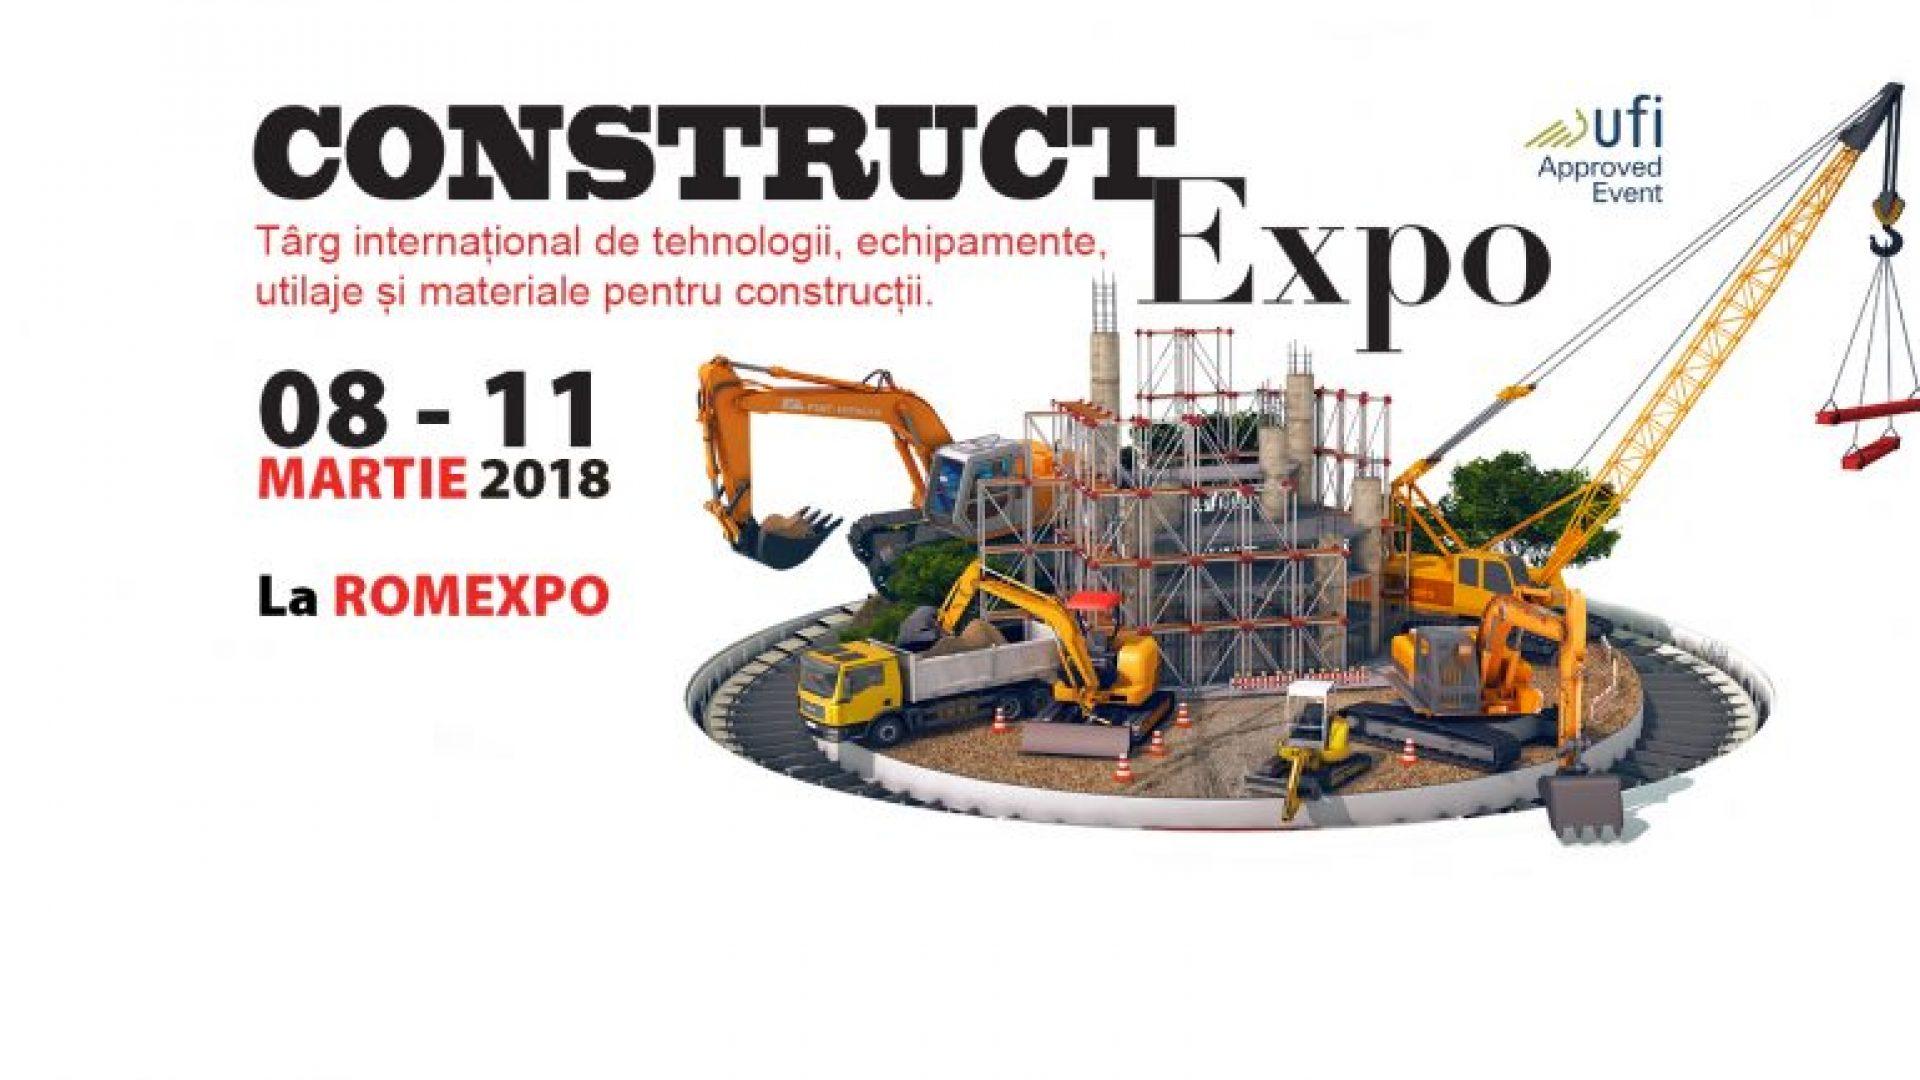 1903-x-800-px-Vizual-CONSTRUCT-2018-RO-1030x433